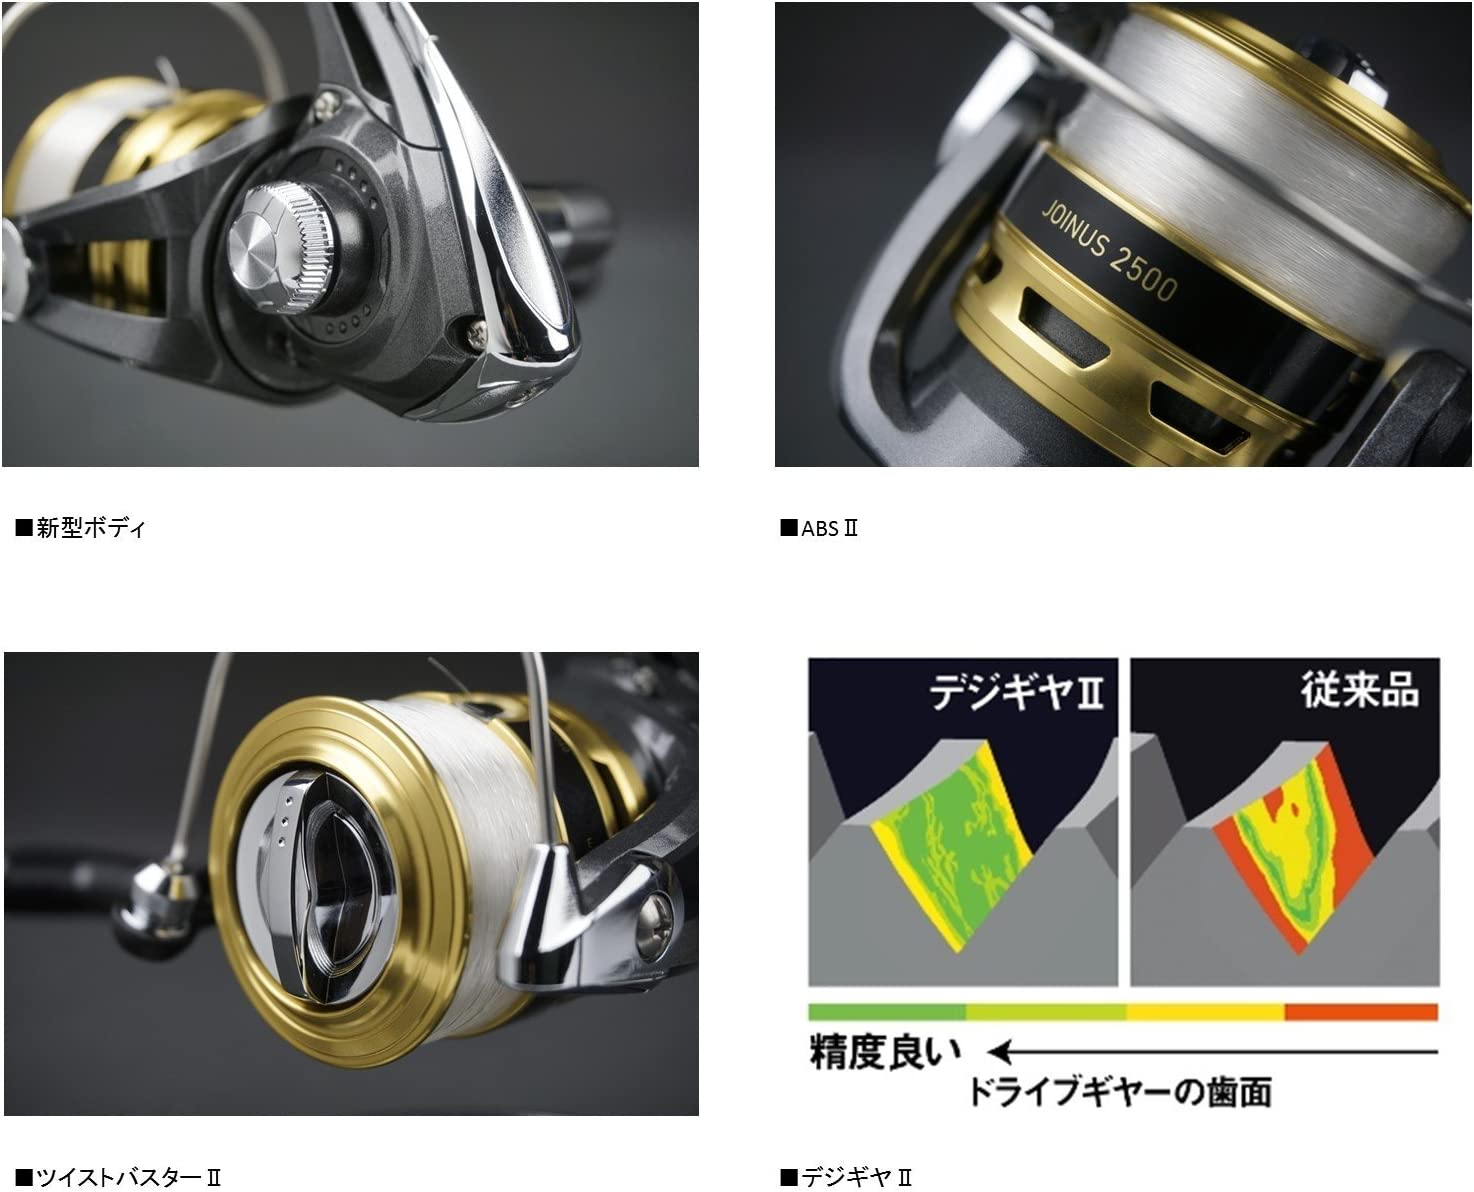 Daiwa Daiwa Daiwa 16 JOINUS 3500 Spinning Reel Japan Import